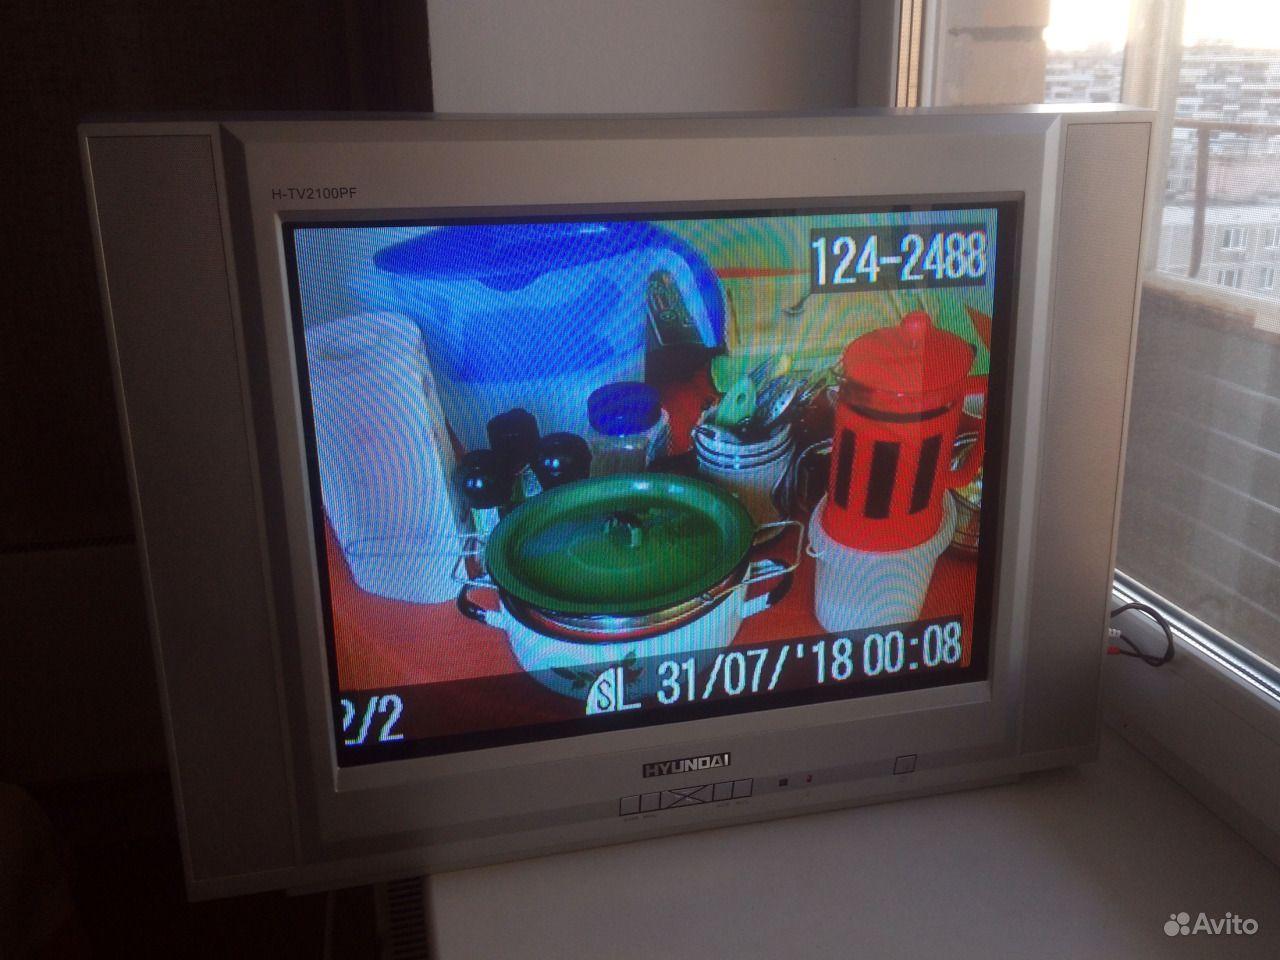 телевизор hyundai h-tv2100pf